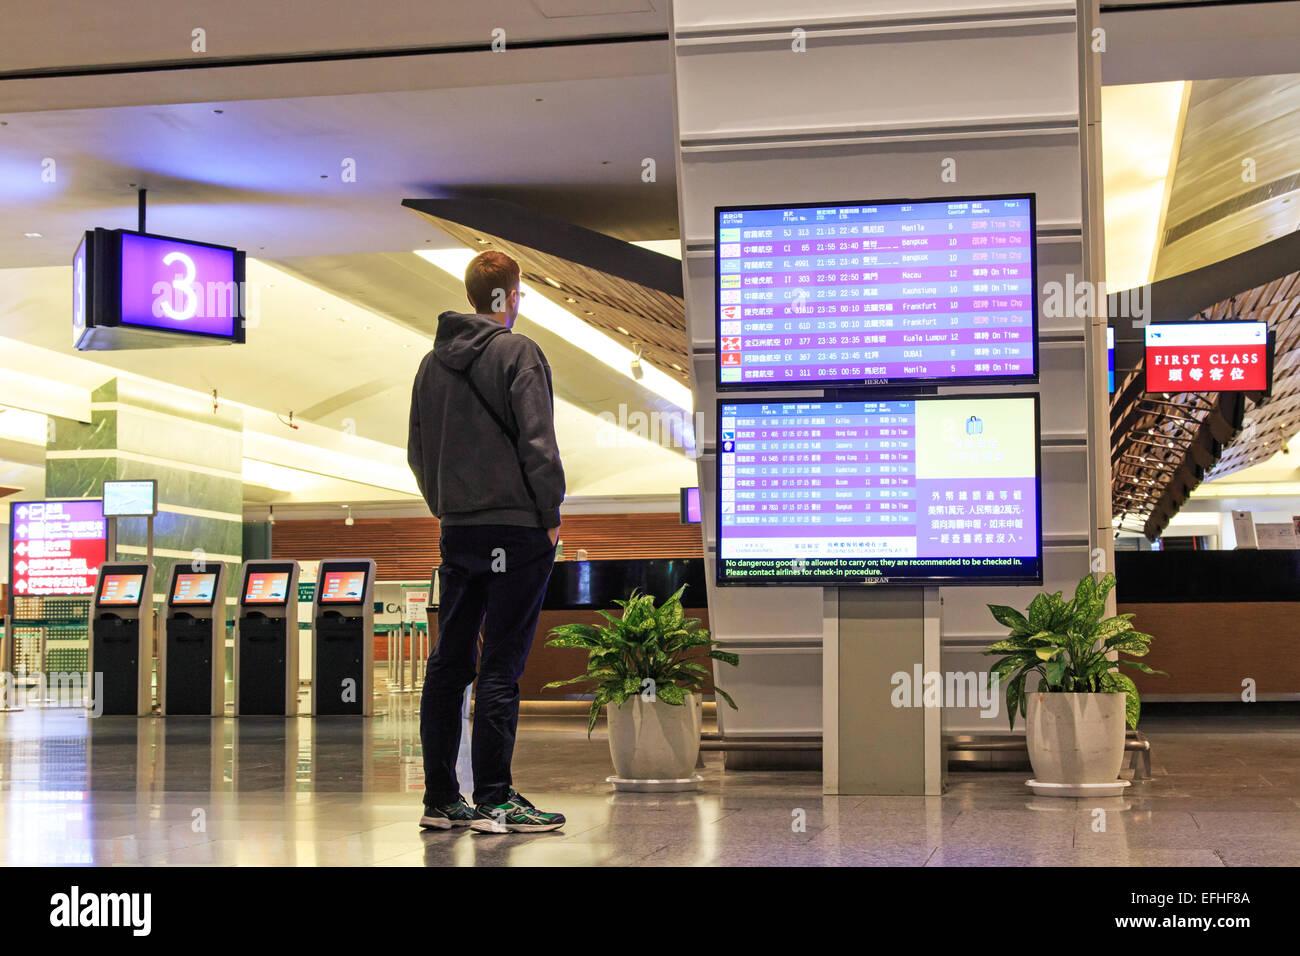 Taipei, Taiwan - January 9, 2015: Man stading in front of a Flight Information Board inside the Taiwan Taoyuan International - Stock Image